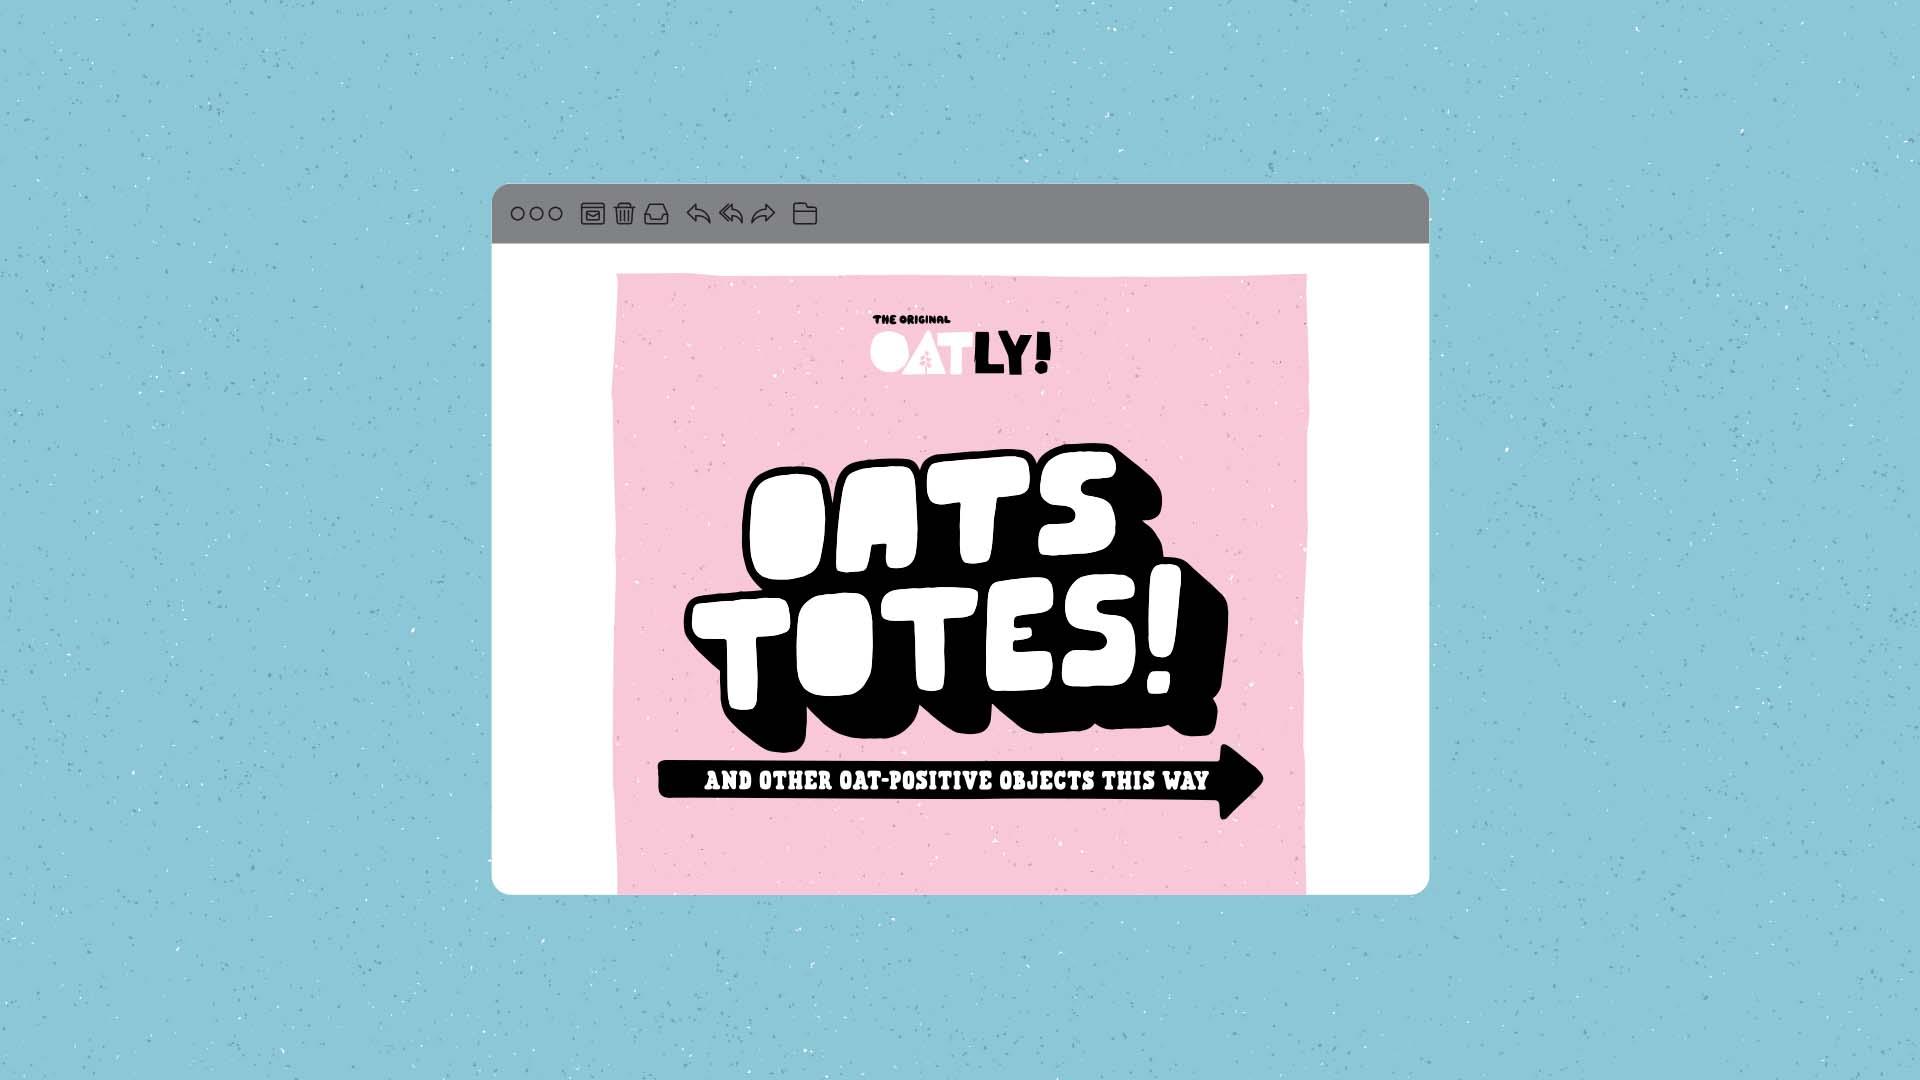 OatsTotes